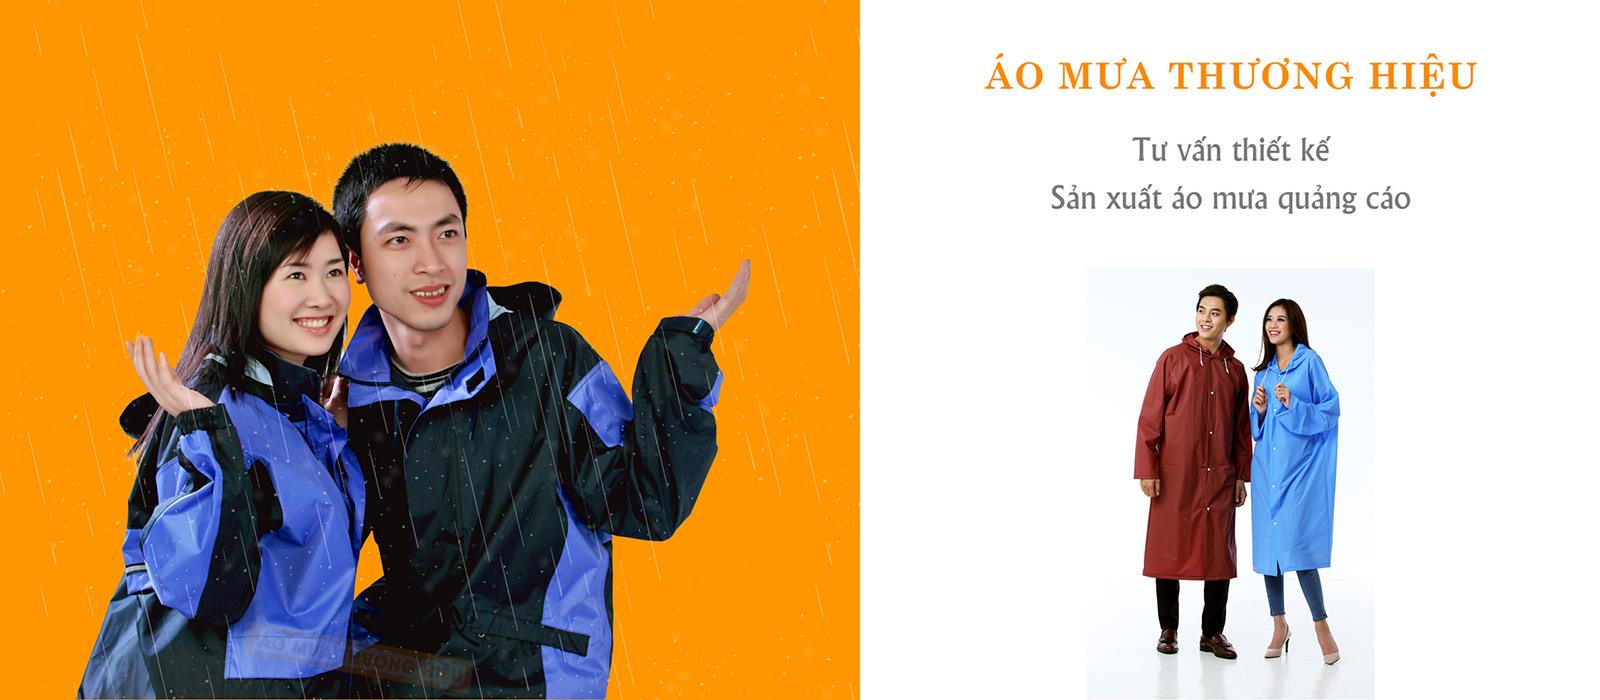 Banner ao mua thuong hieu 09